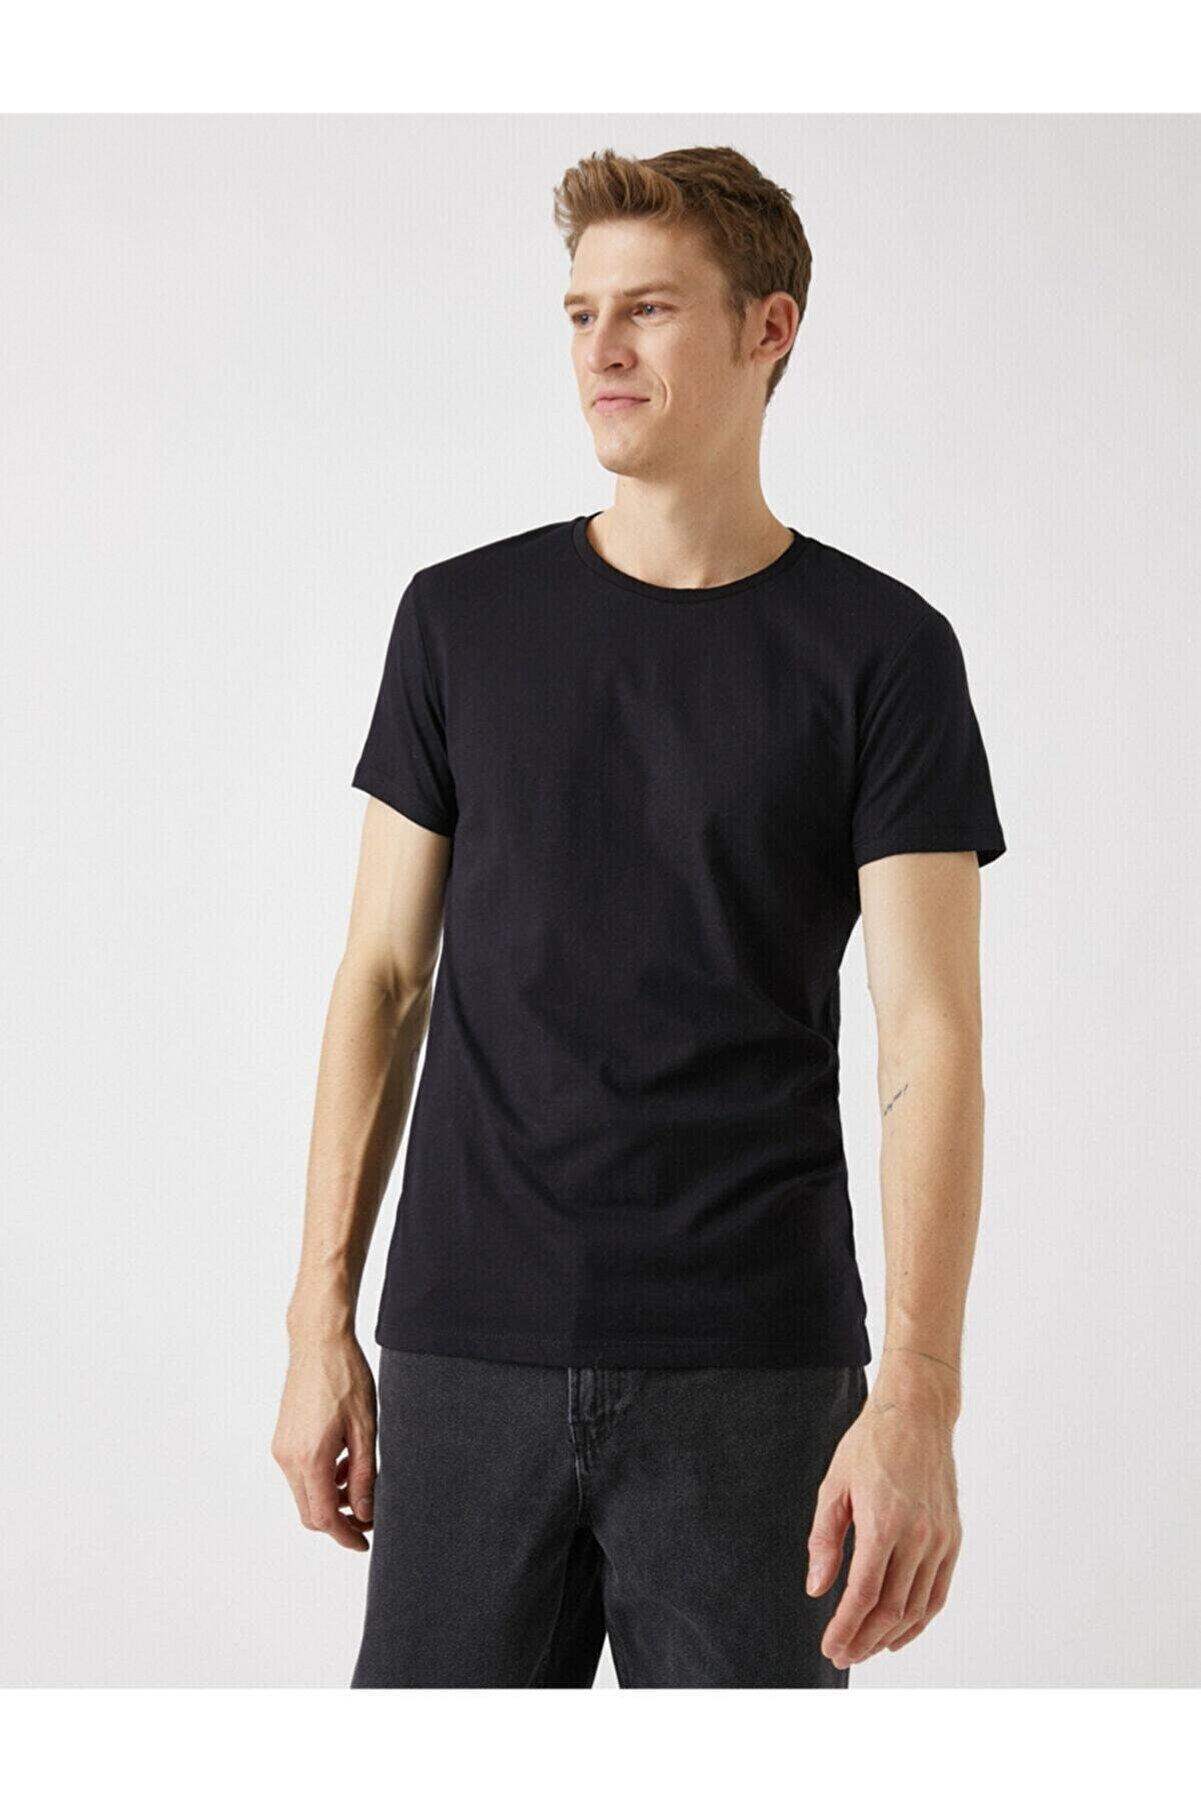 Koton Erkek Siyah Basic Kısa Kollu Bisiklet Yaka T-shirt